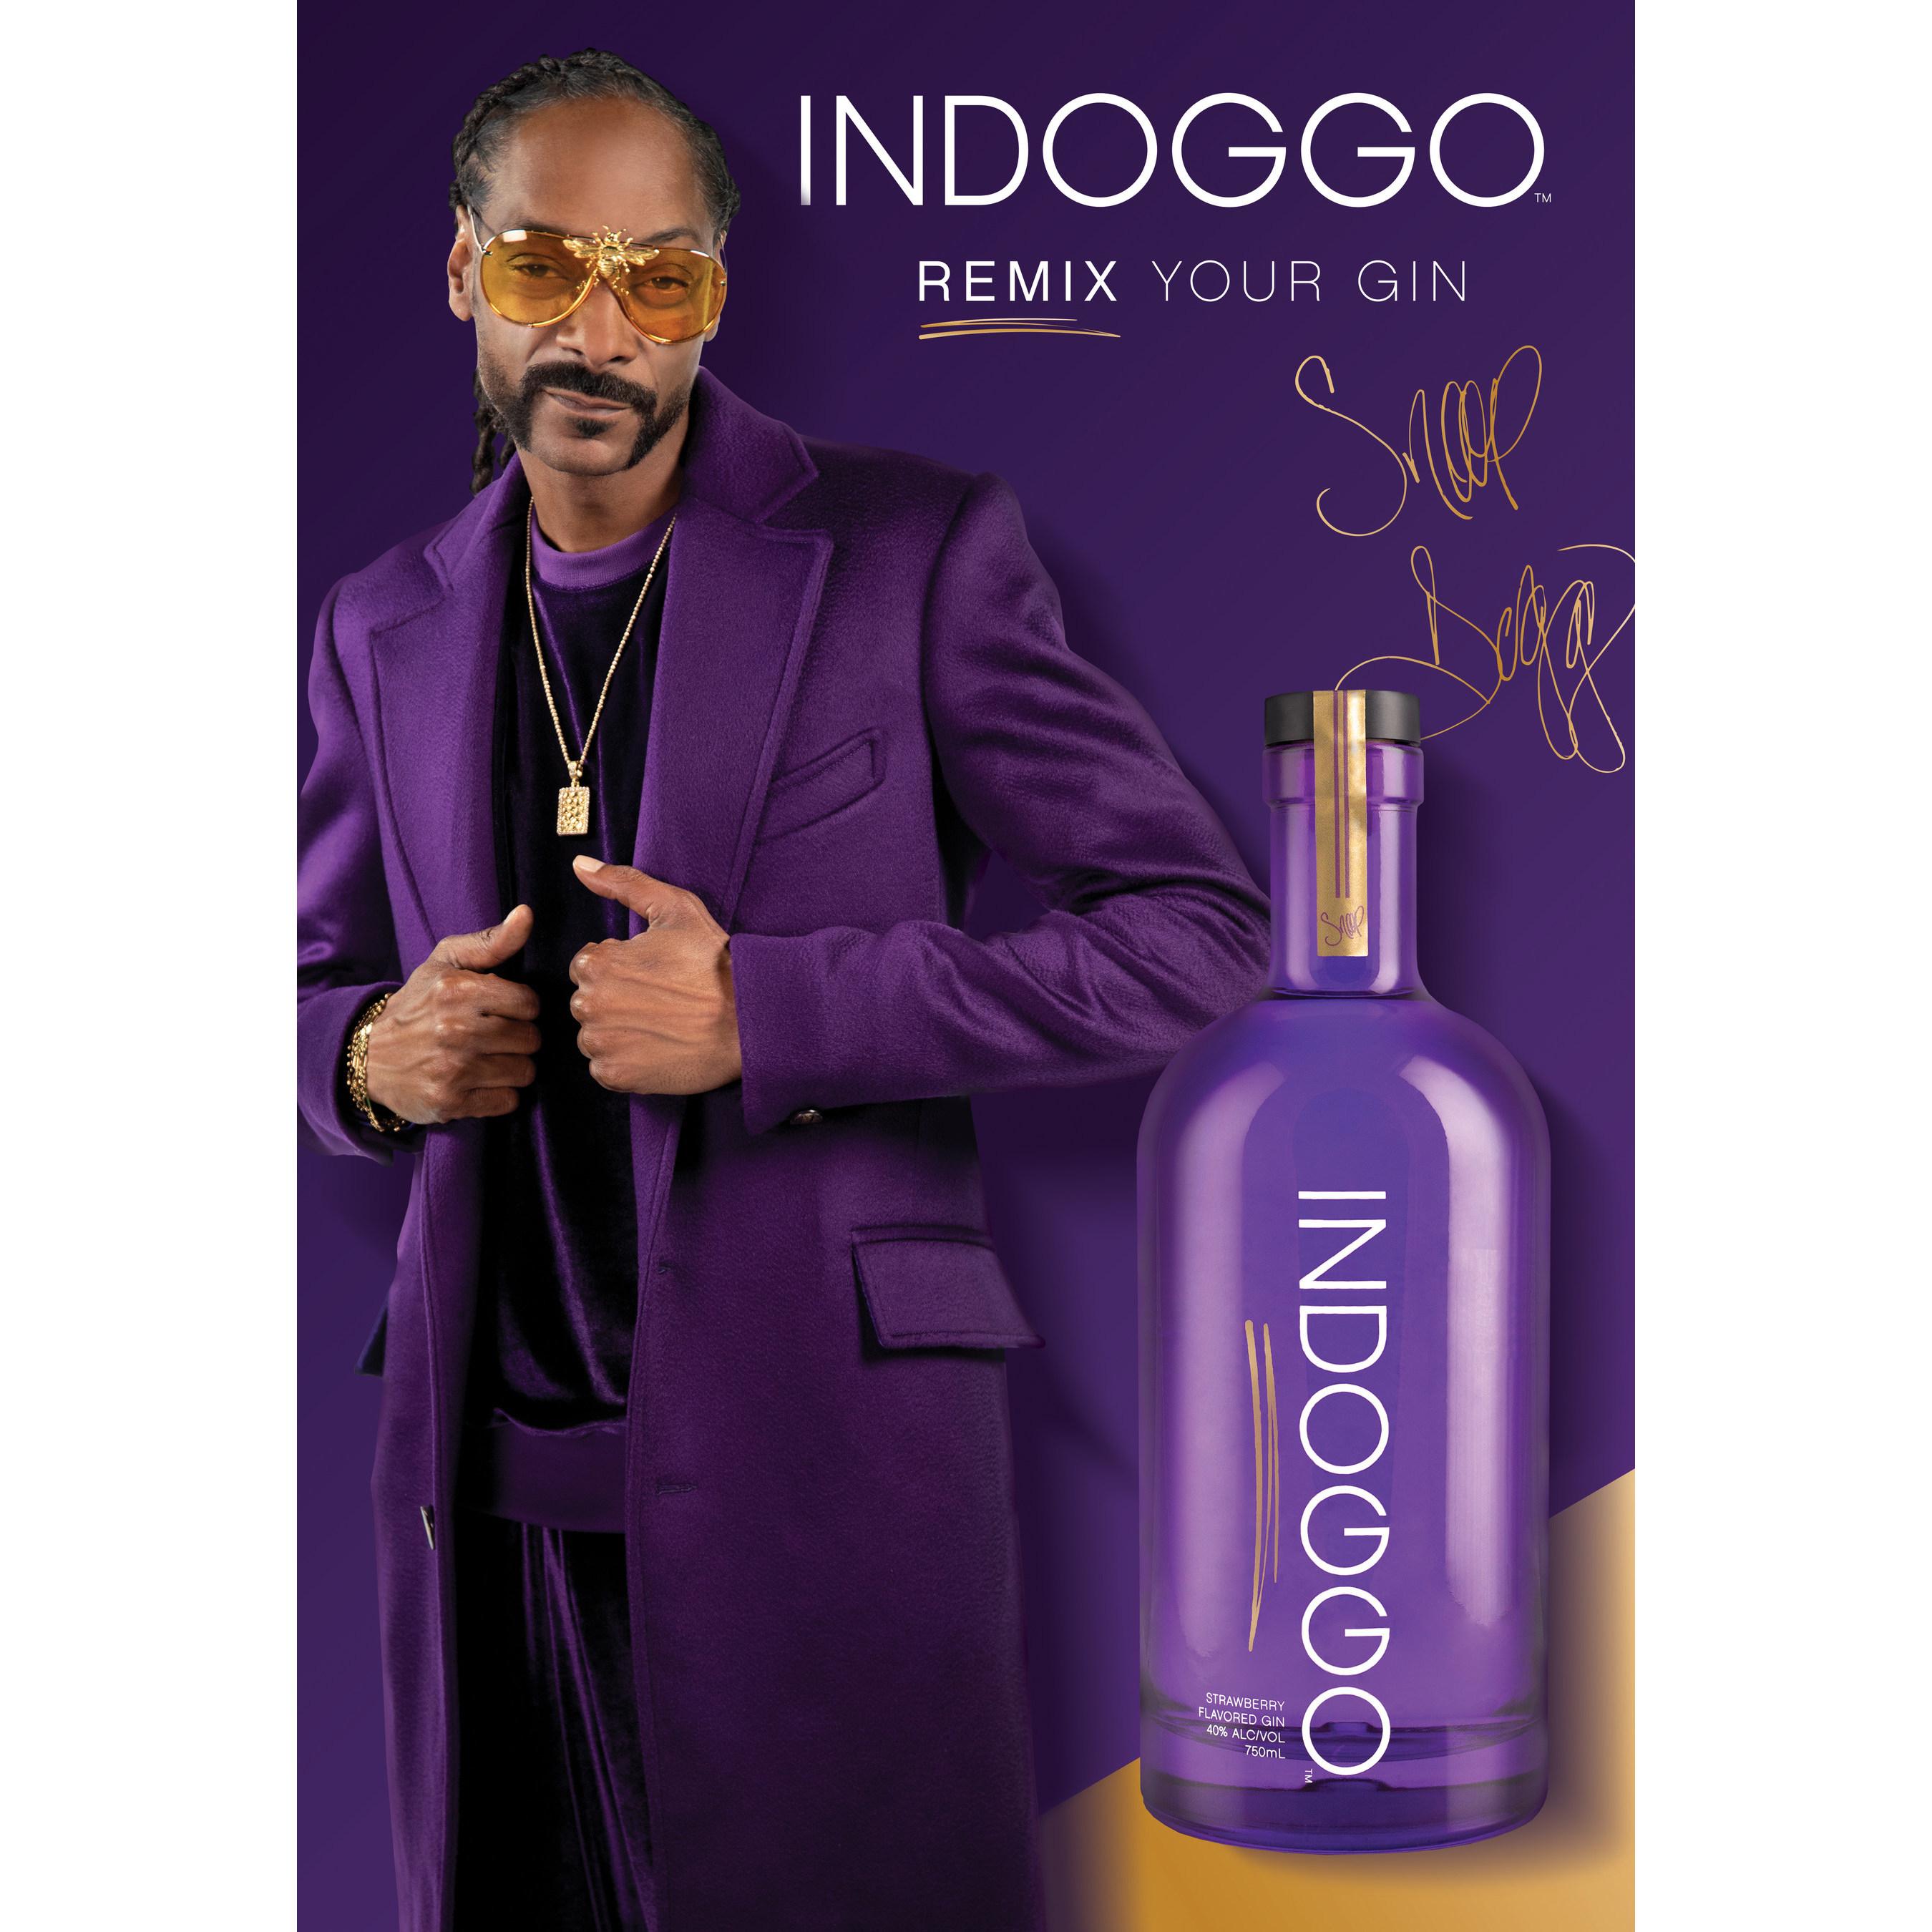 Snoop Dogg Launch His Gin Brand Indoggo